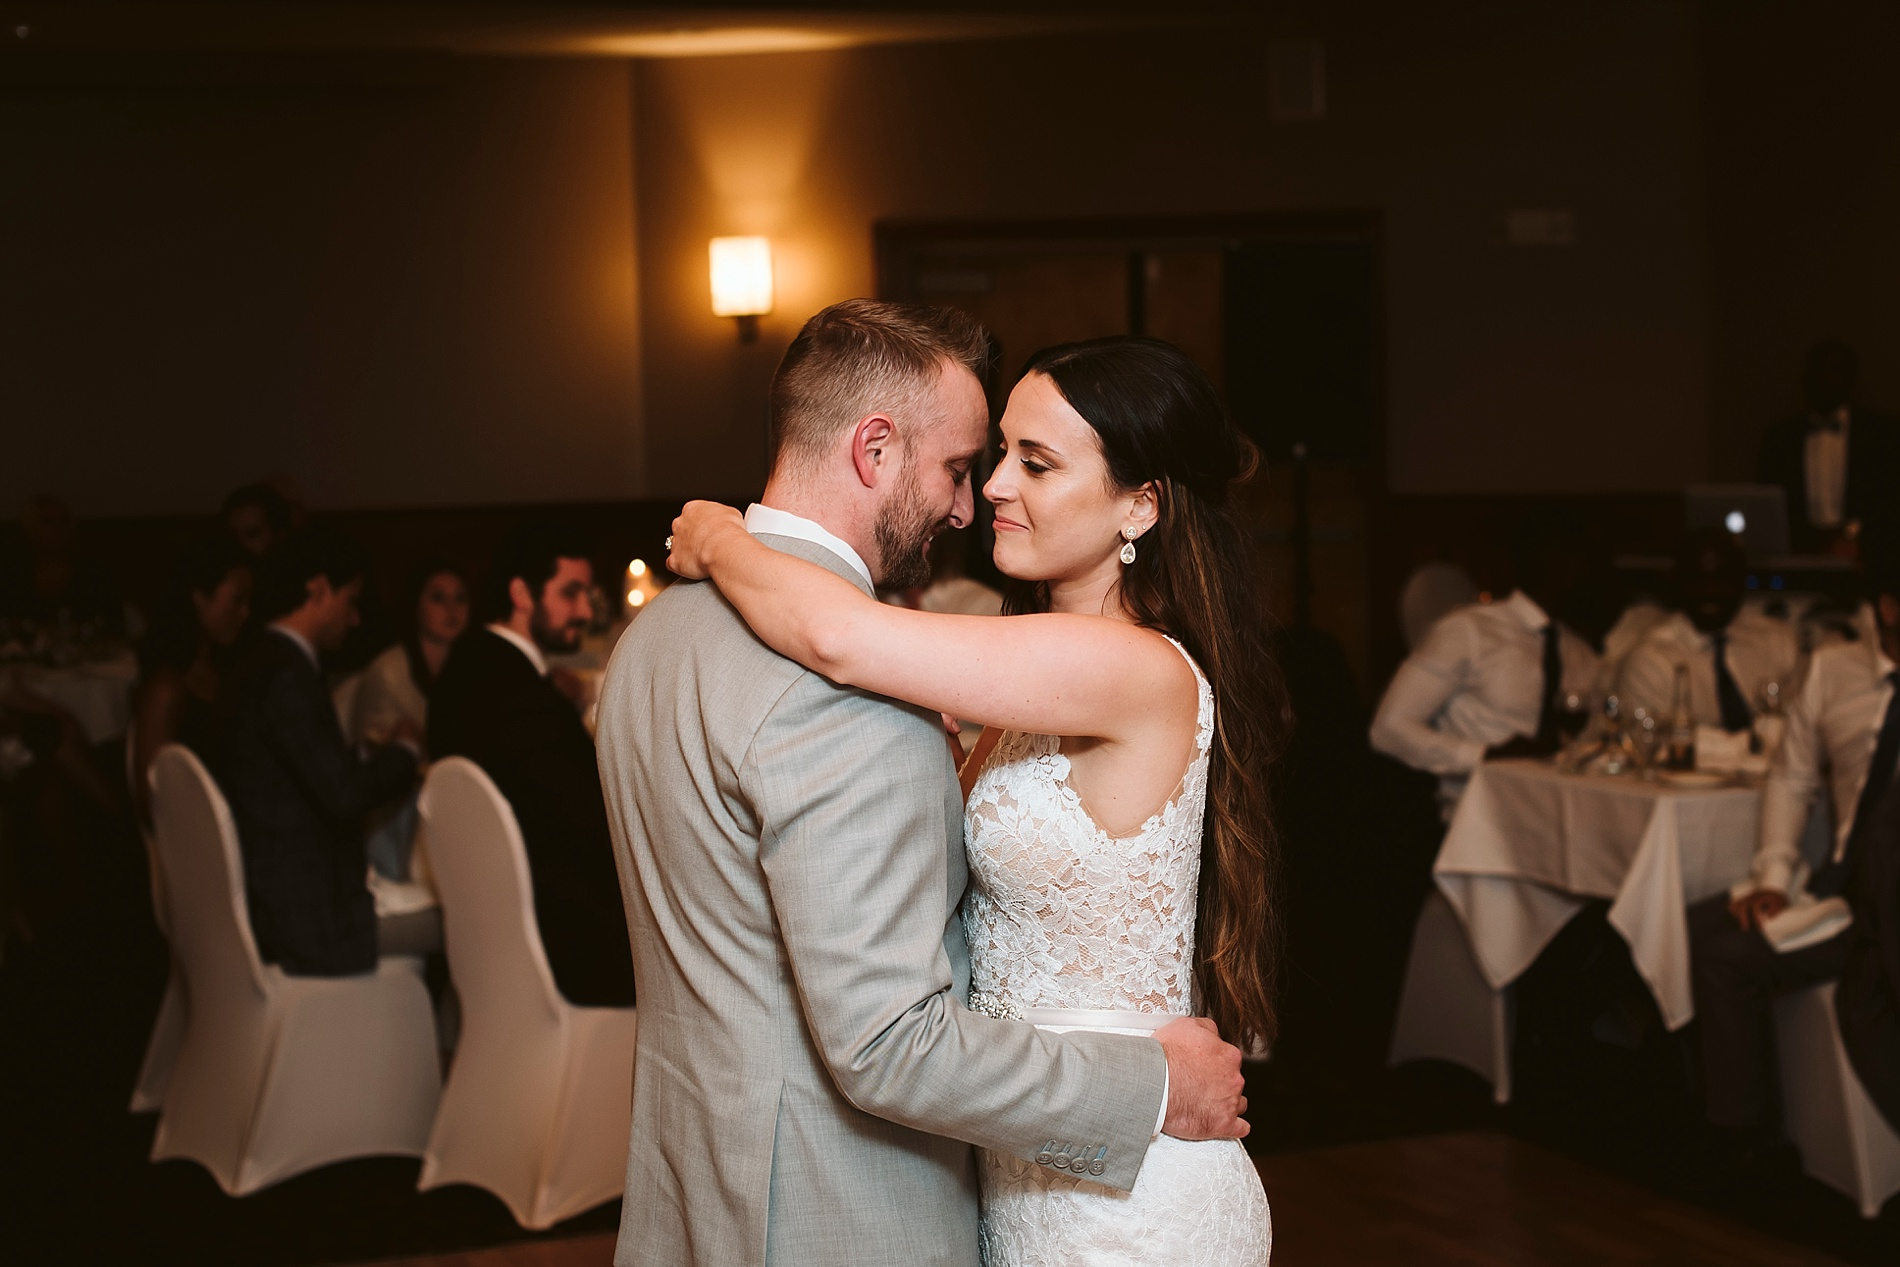 Kawartha_Lakes_Wedding_Bobcageon_Eganridge_Resort_Toronto_Photographer_0069.jpg